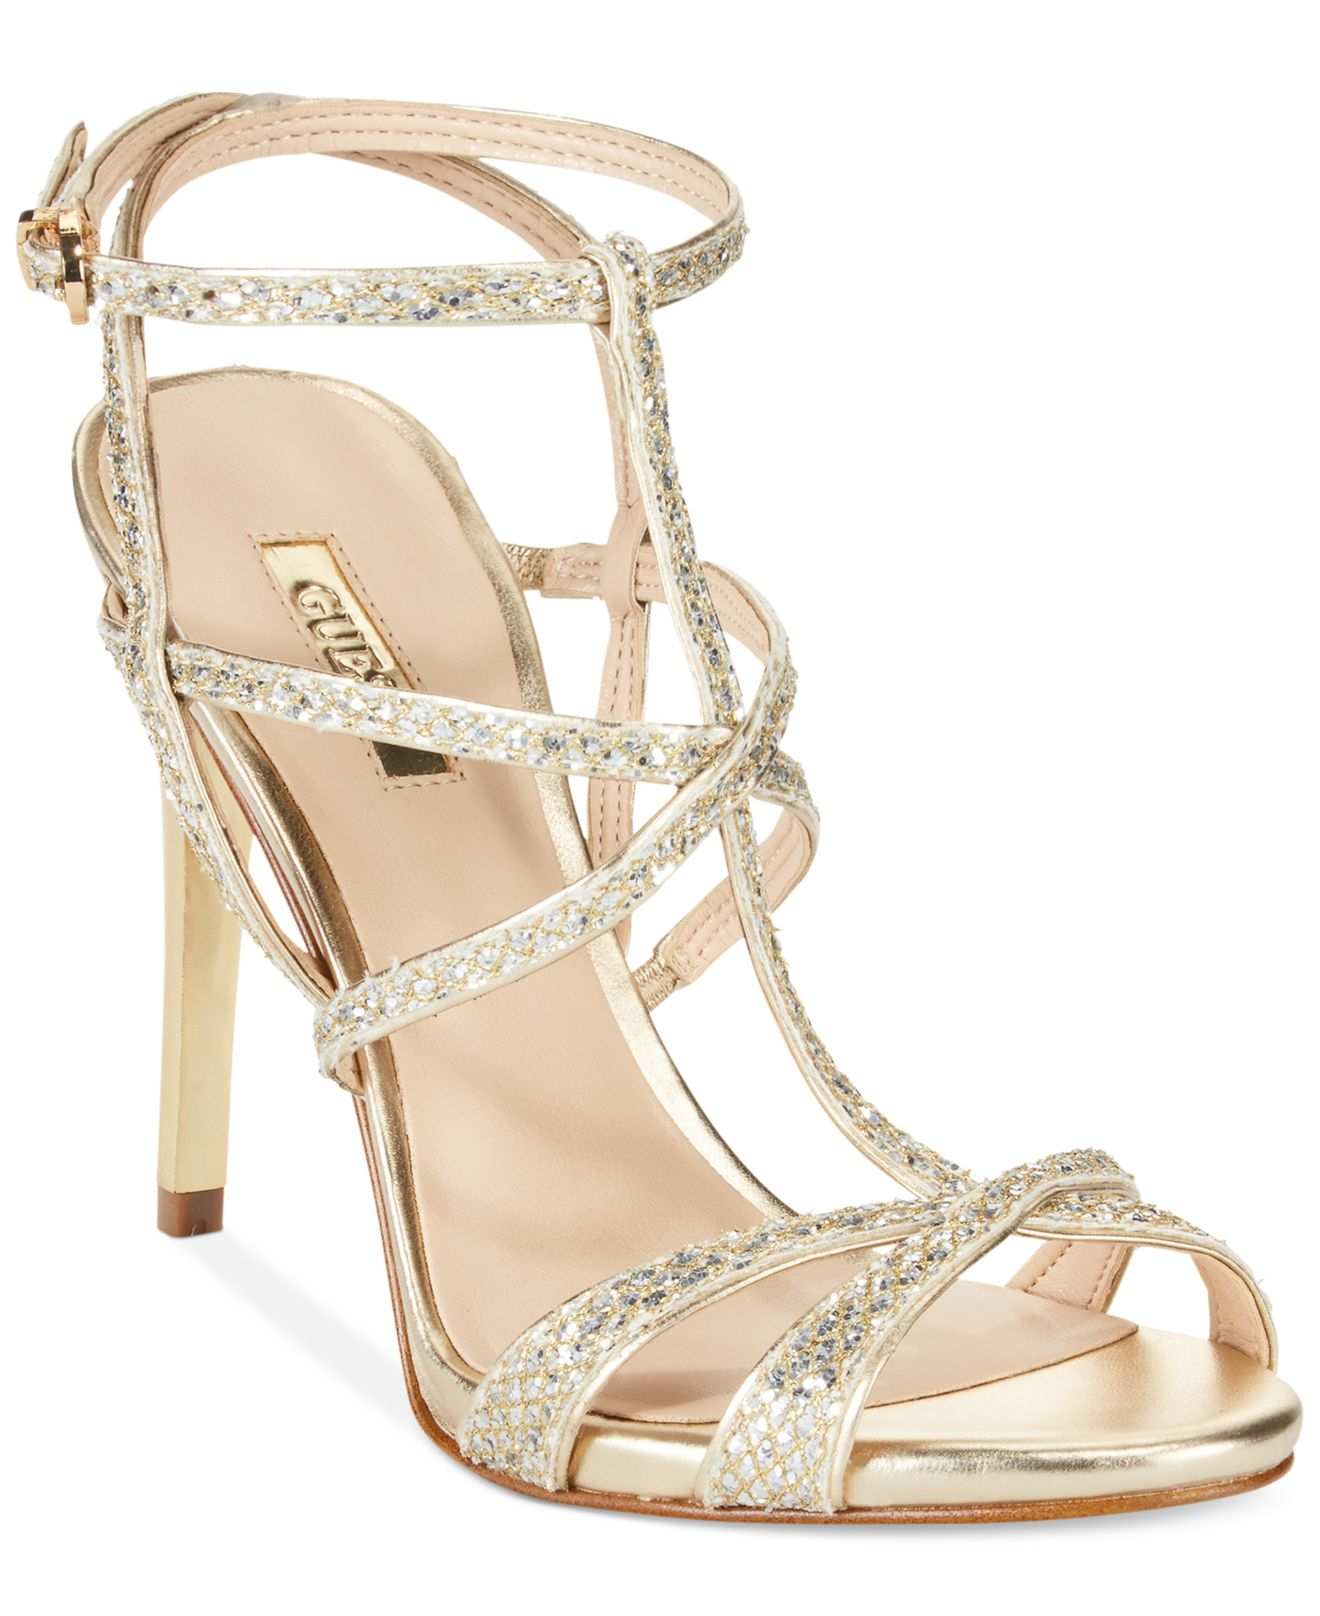 Gold Glitter Strappy Heels